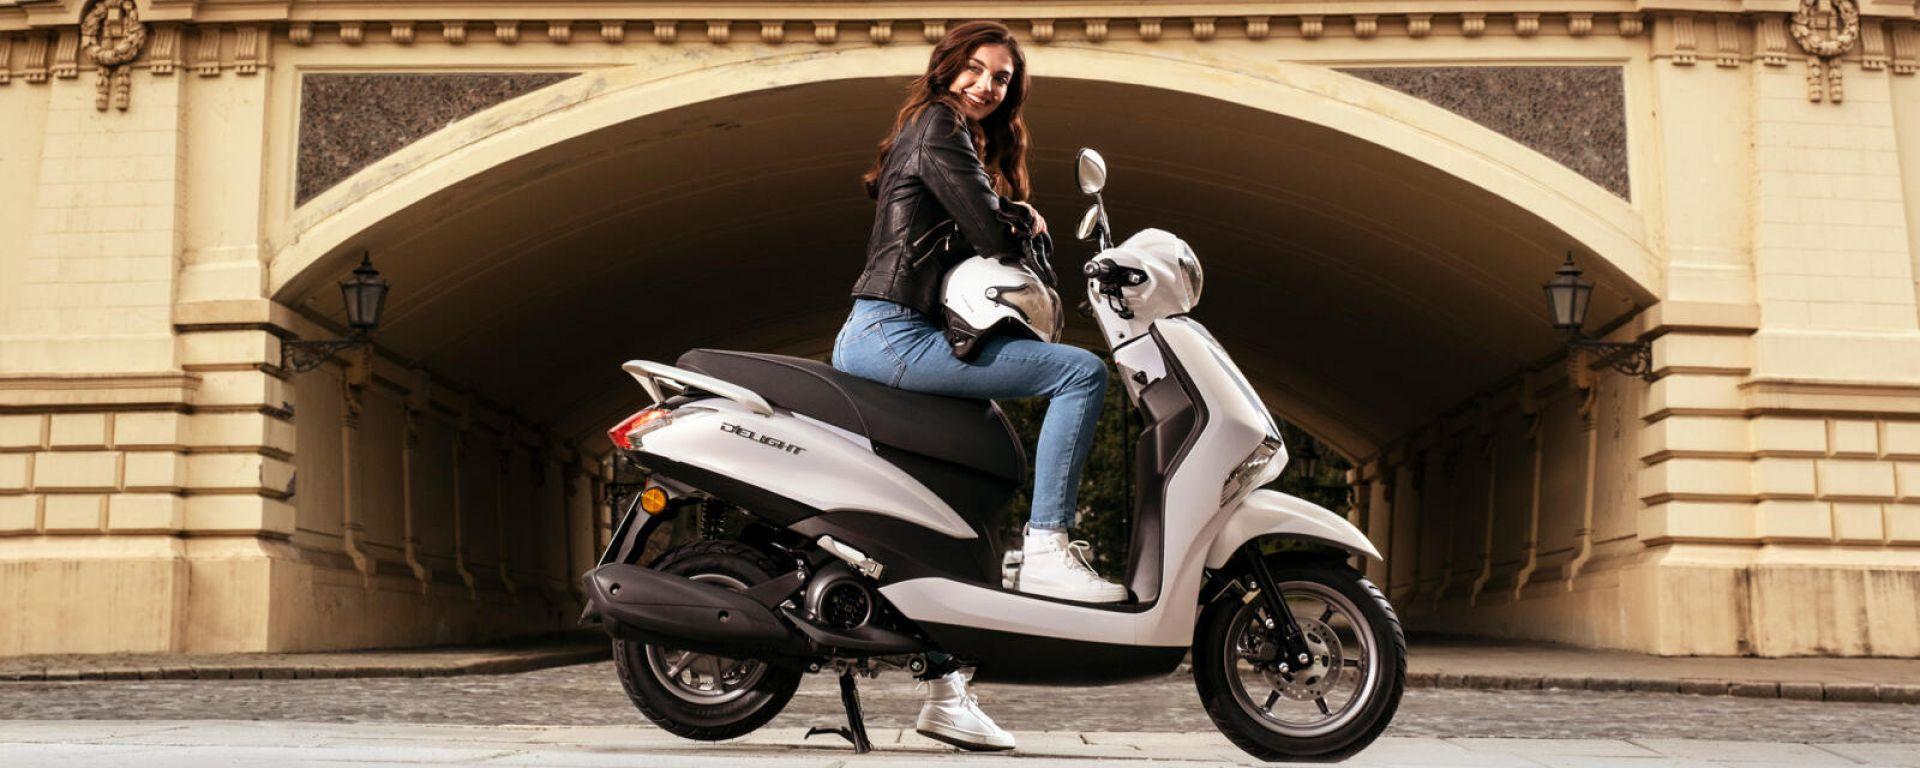 Yamaha D'elight 125 si rinnova: peso piuma e prezzo sotto i 3.000 euro